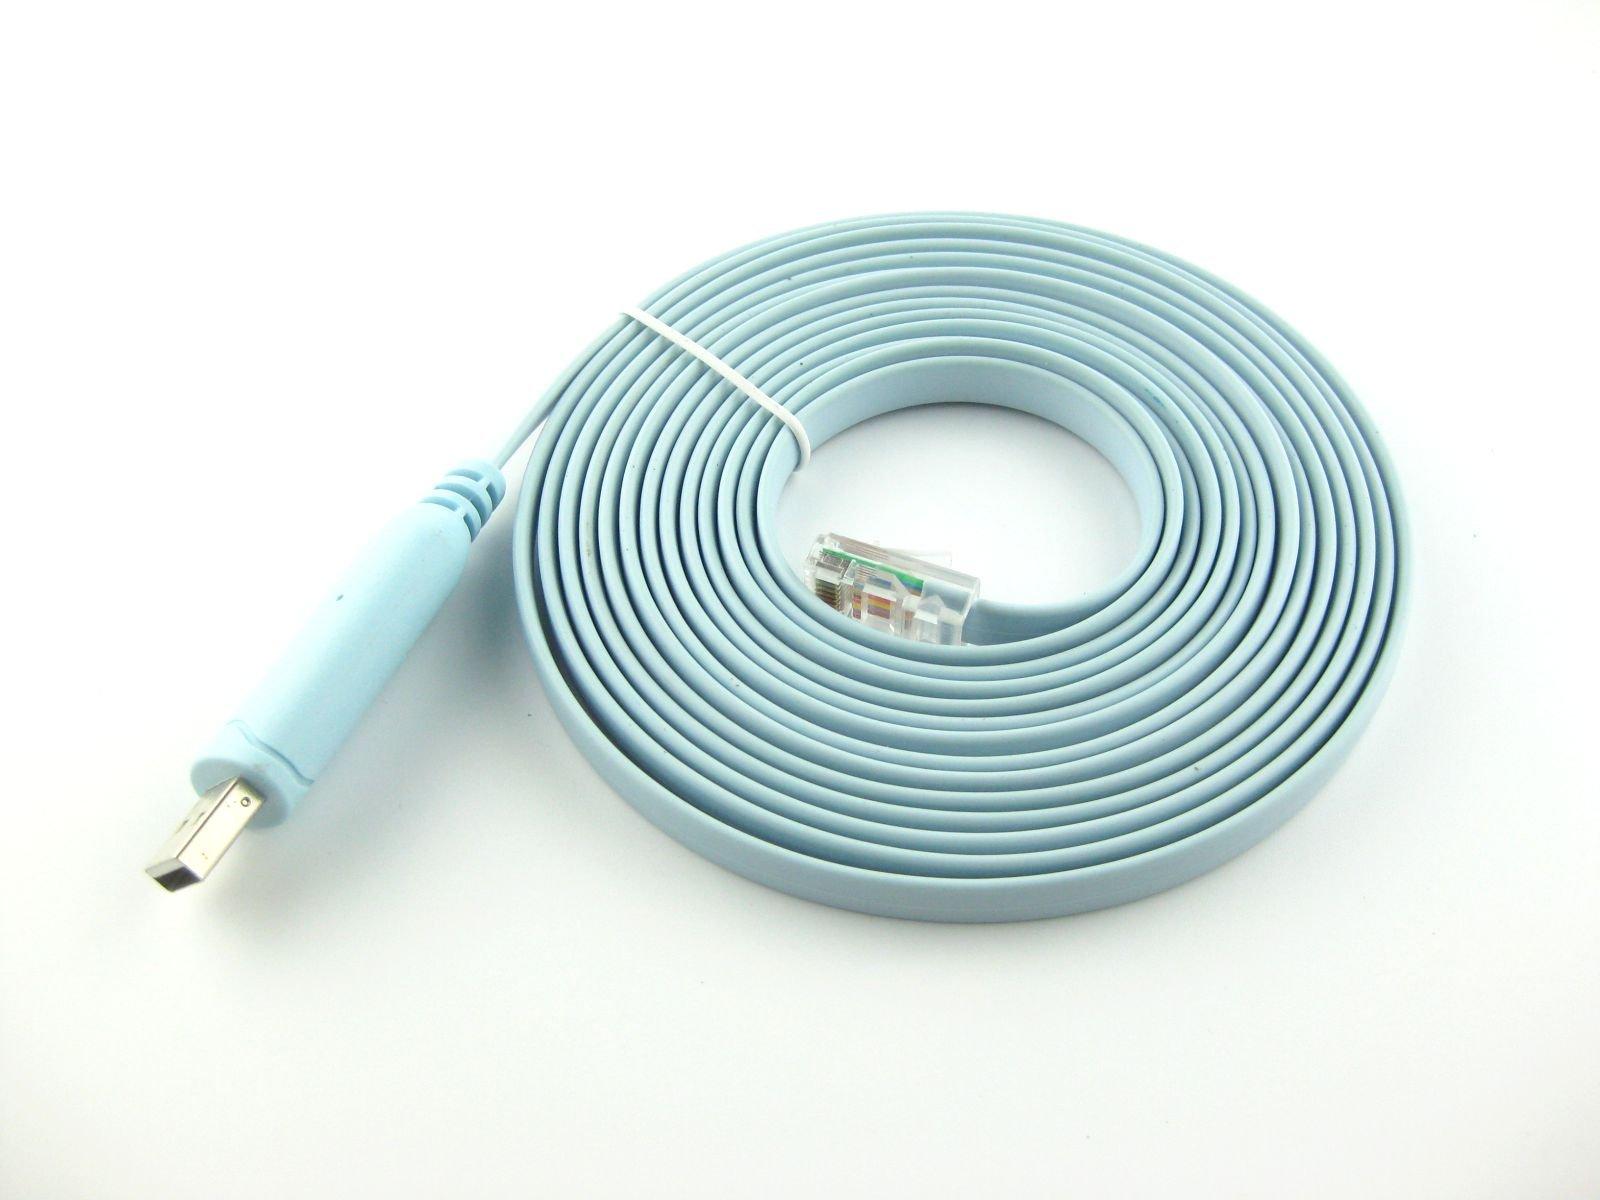 Buy Green-utech 12ft USB Rs232 - Rj45 Adapter for Cisco Router ...